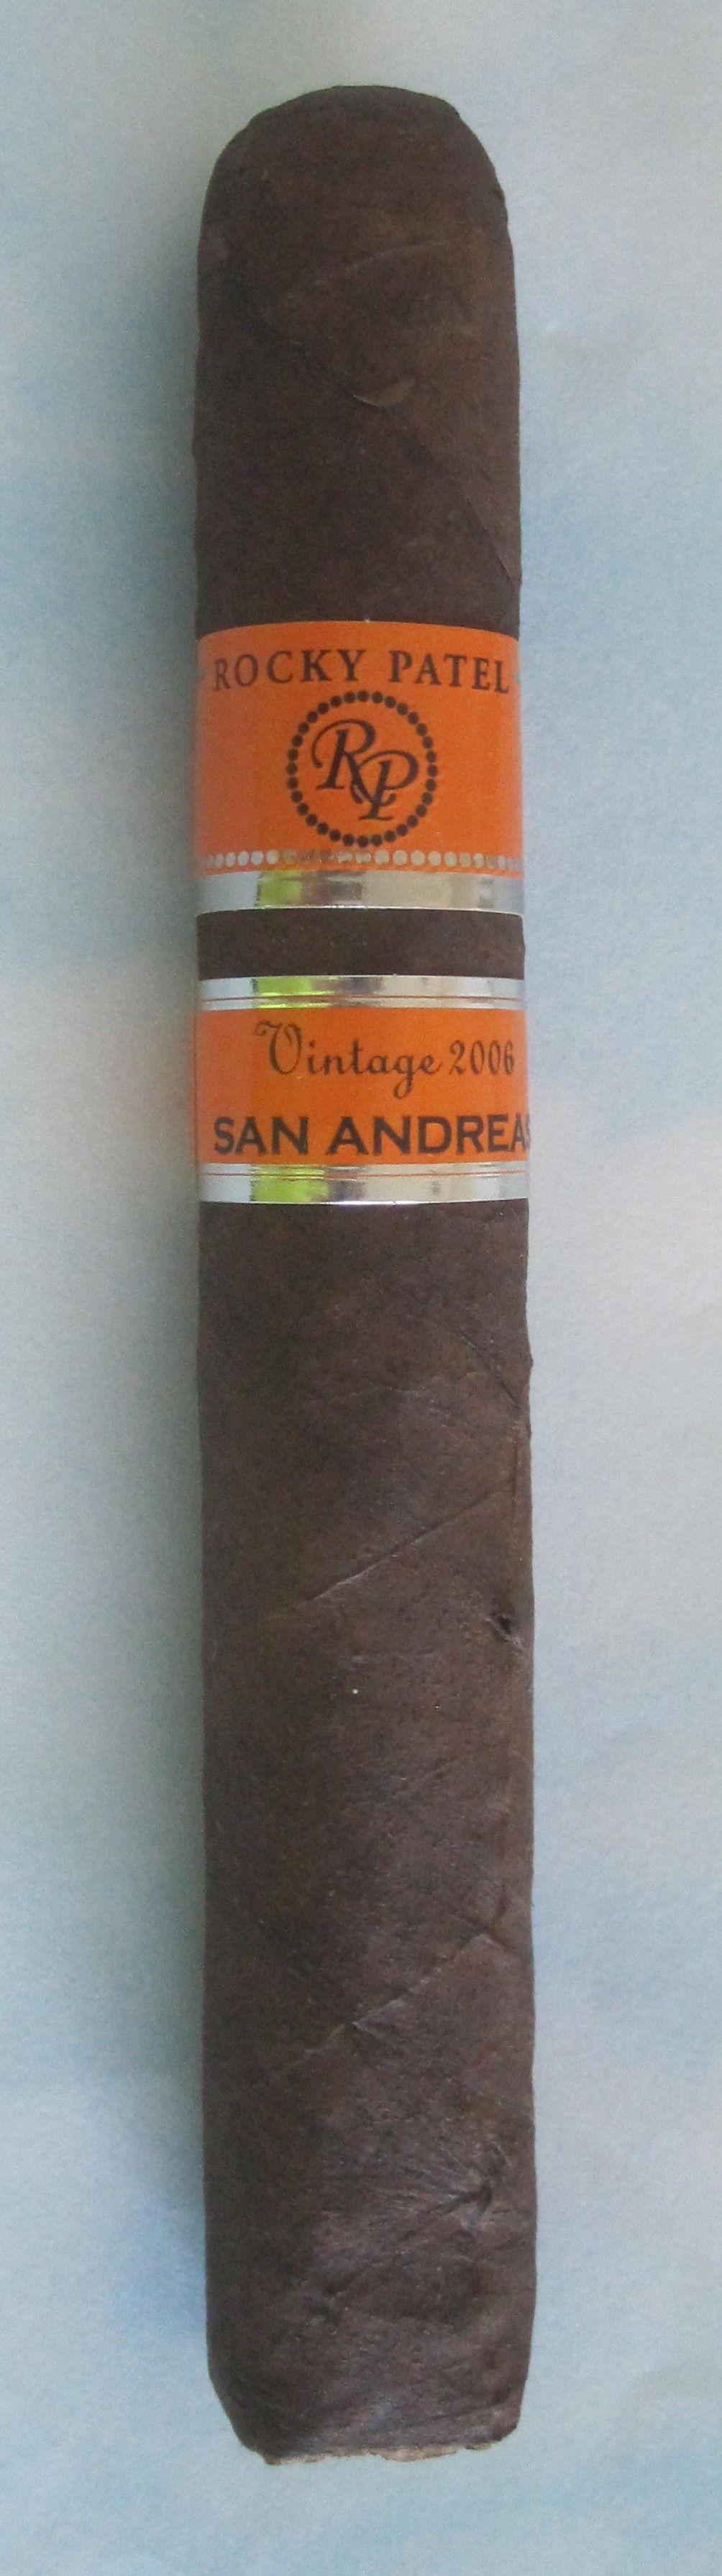 Rocky Patel Vintage 2006 Cigar